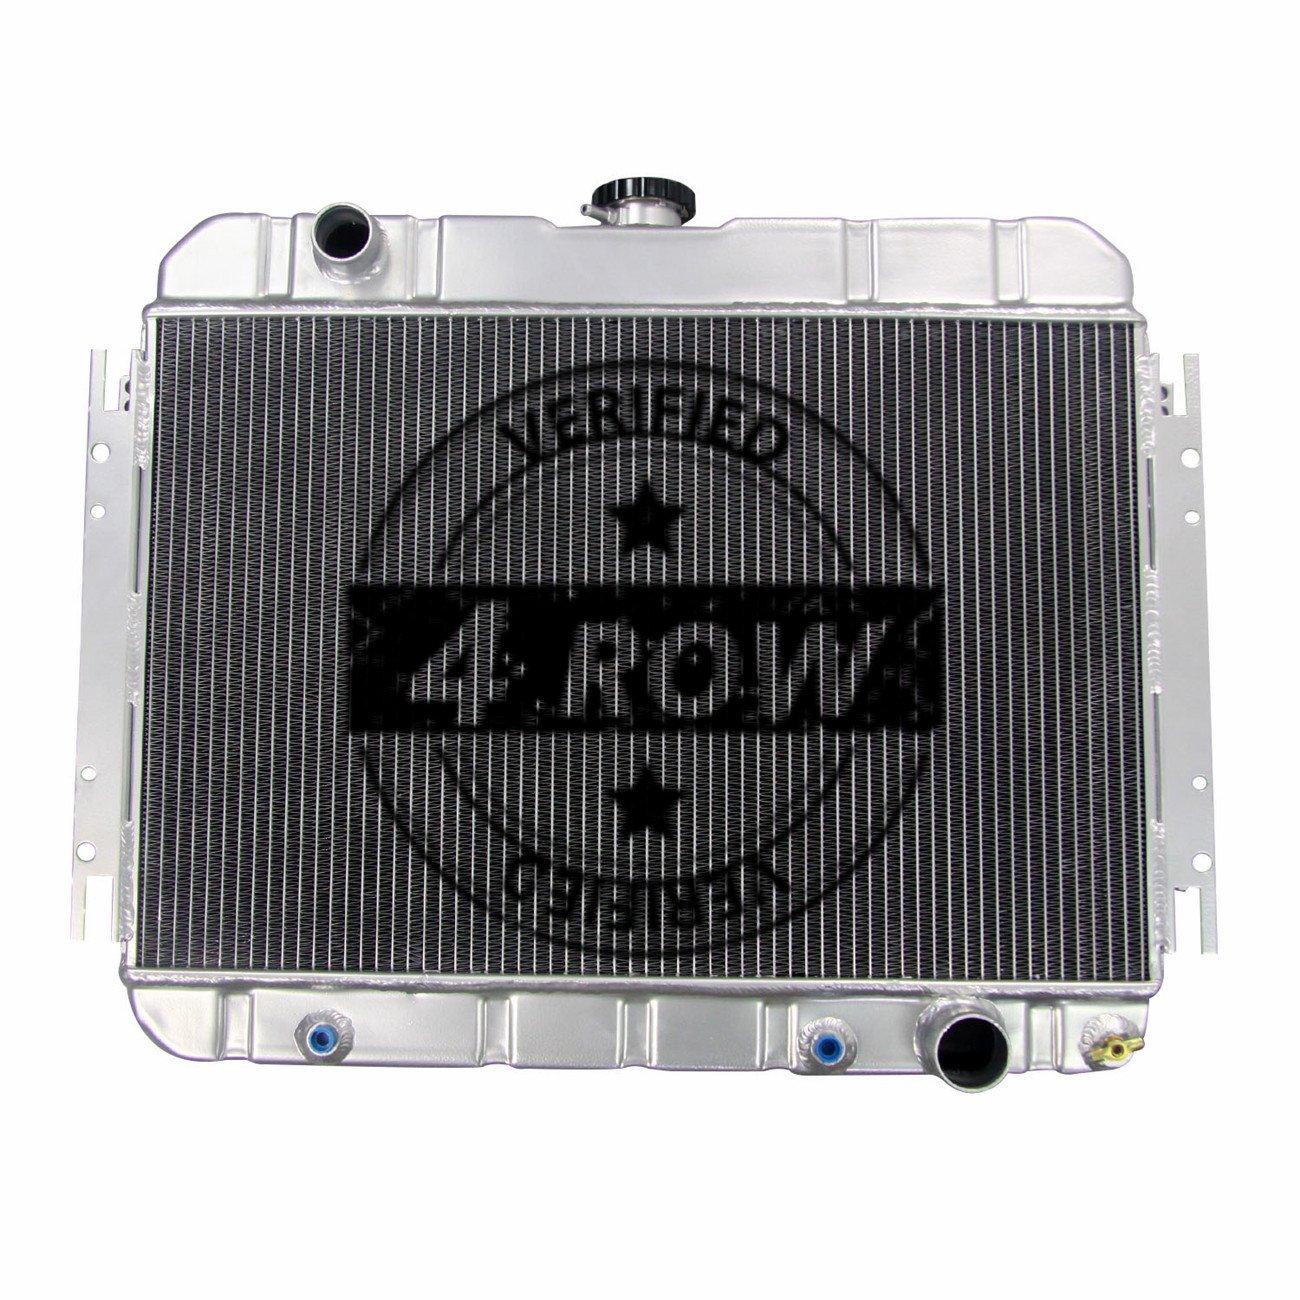 "Pontiac GTO Custom Aluminum Radiator Fan Shroud /& 2-14/"" Fans 17 x 28 1//4 161"